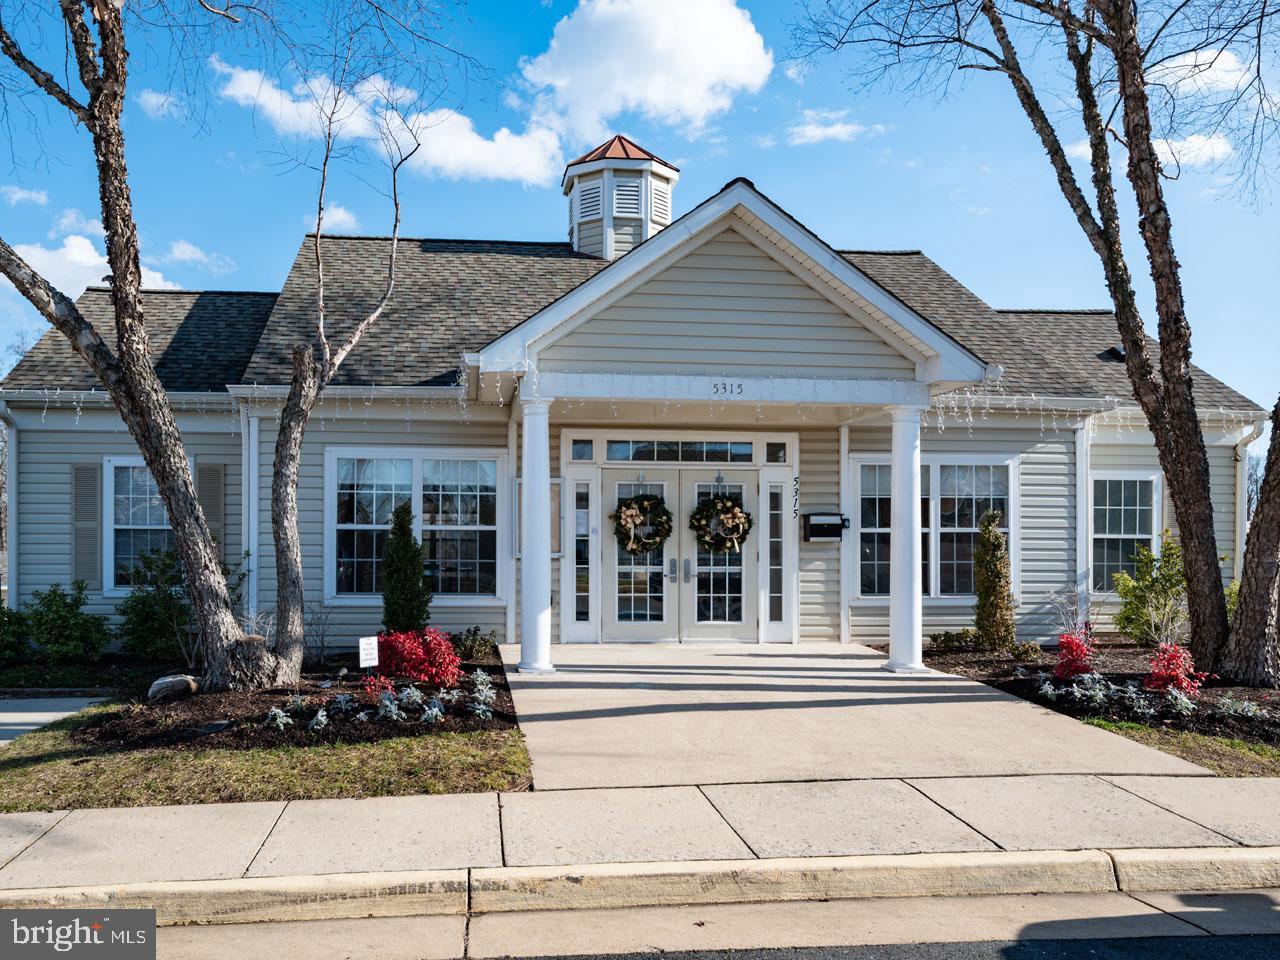 VAFX1104336-302201657455-2021-07-16-19-45-25  |   | Alexandria Delaware Real Estate For Sale | MLS# Vafx1104336  - Best of Northern Virginia